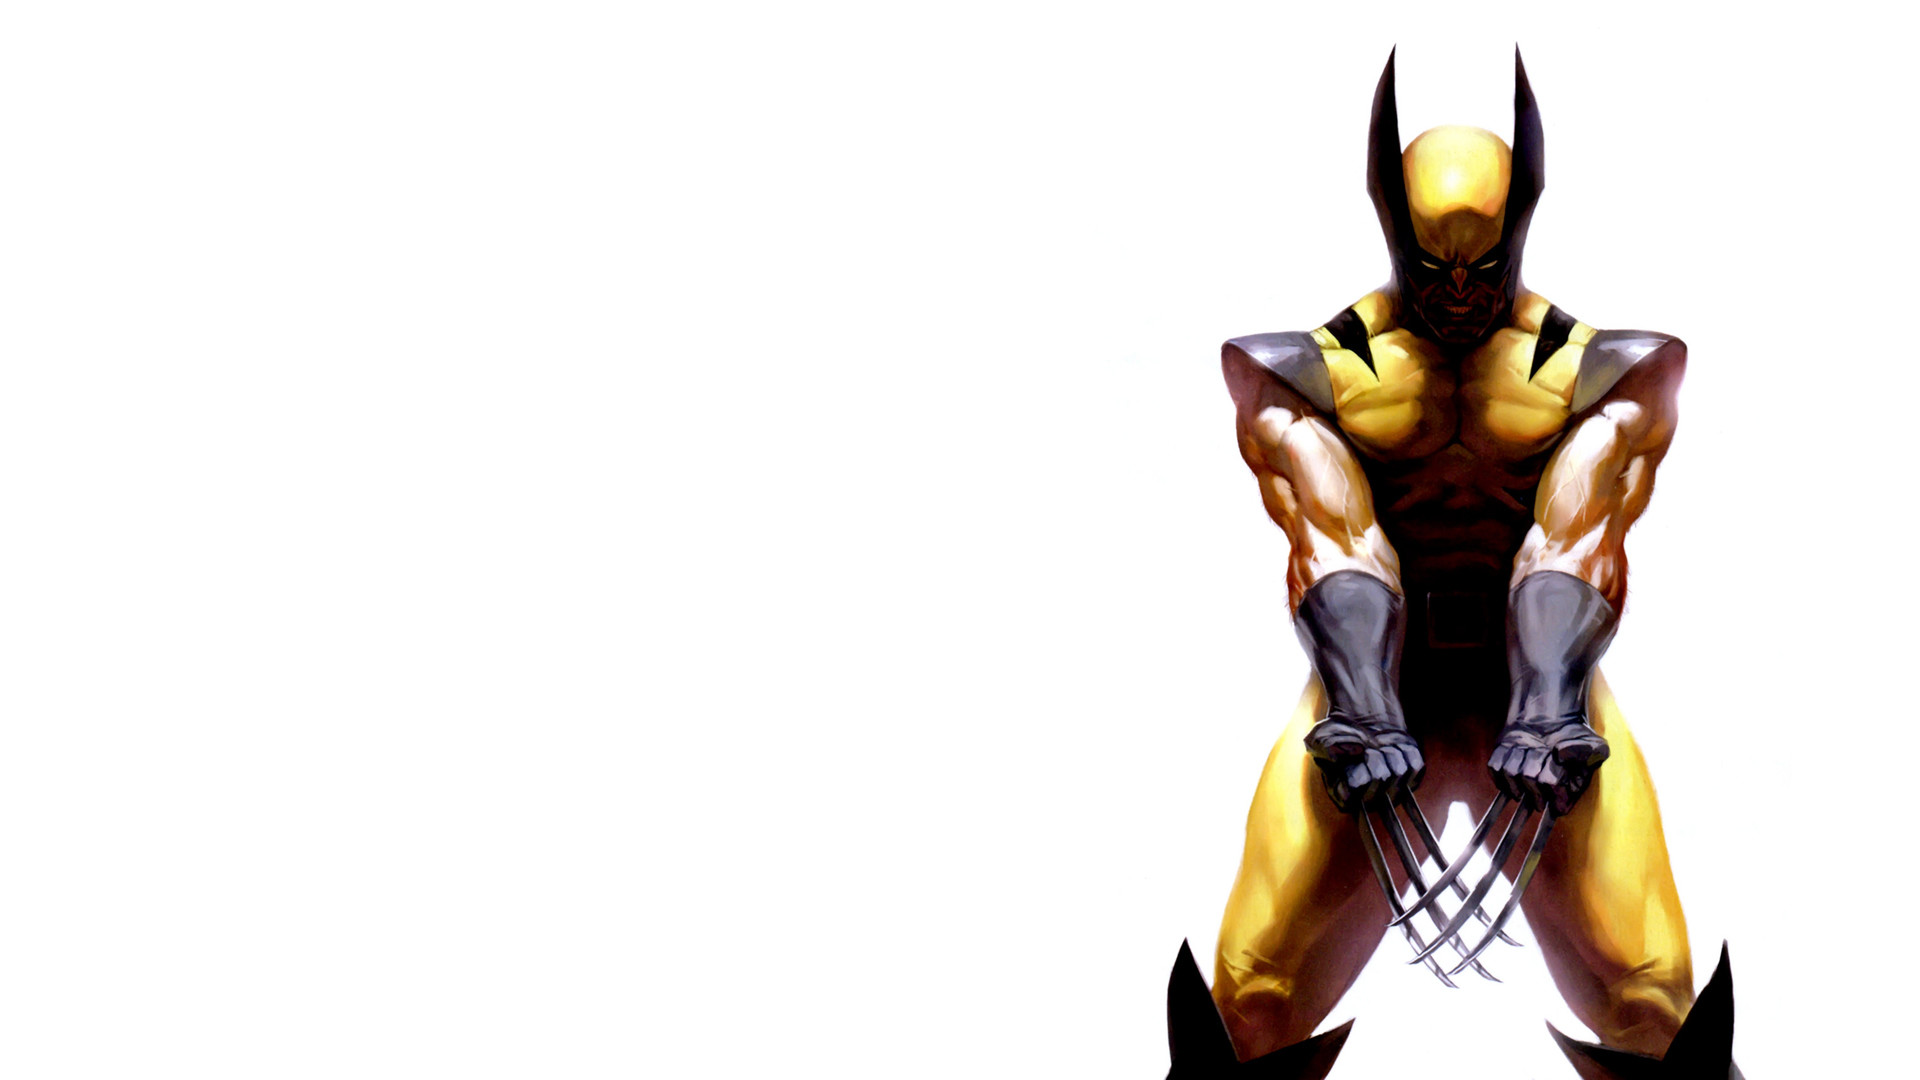 #Wolverine #Wallpaper #marvel | Wallpaper Wolverine | Pinterest | Wallpaper  and Illustrators